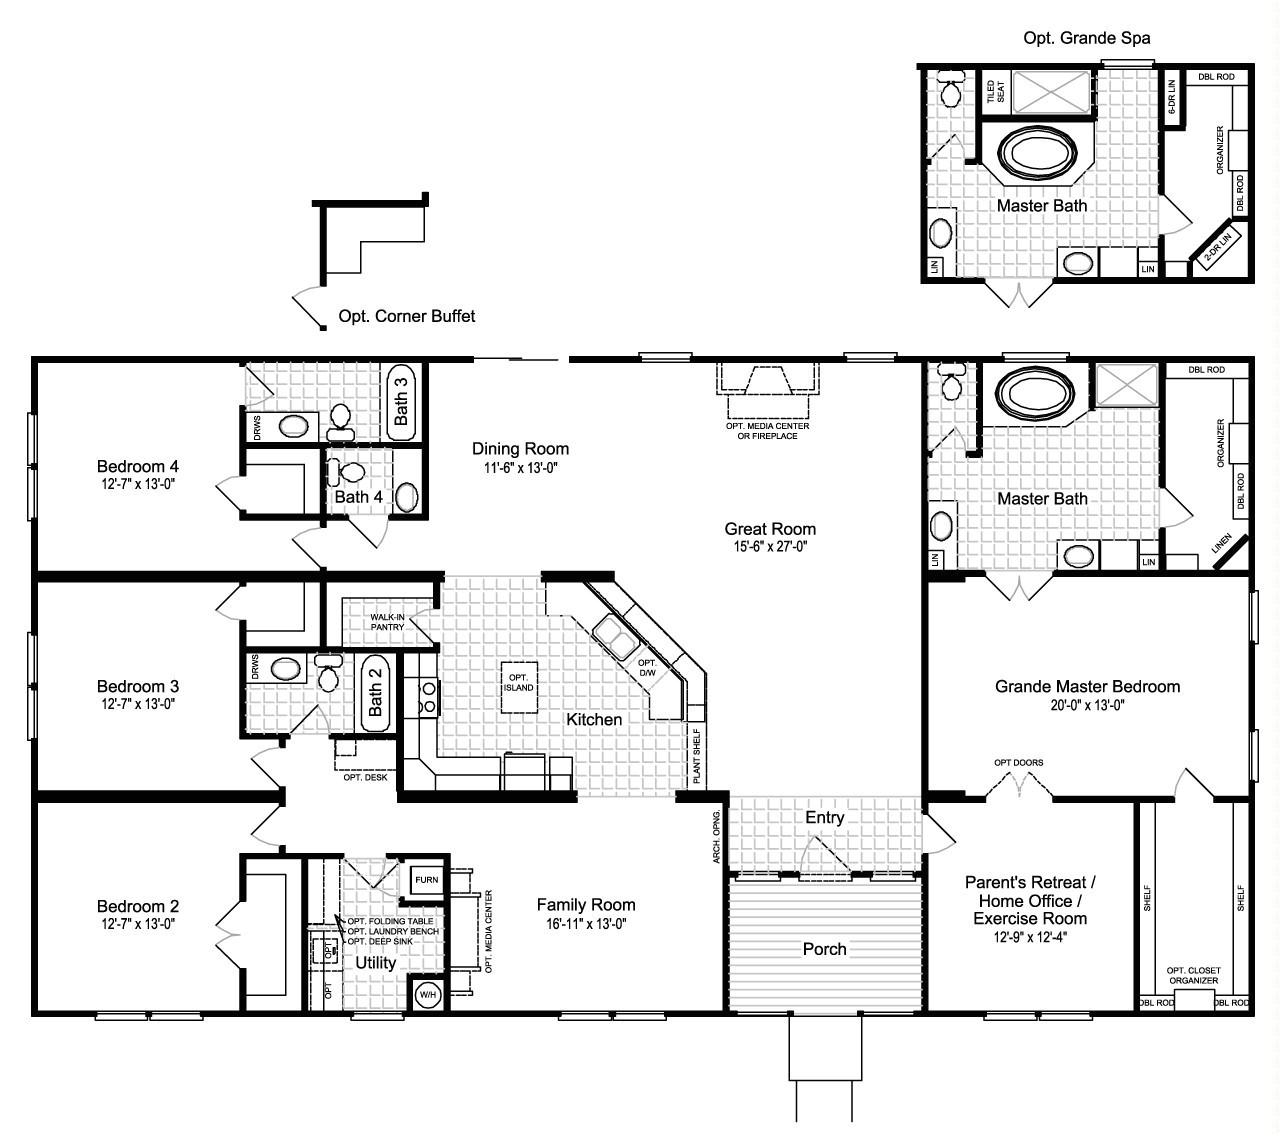 clayton homes rutledge floor plans inspirational clayton homes texas best clayton homes rutledge floor plans fresh